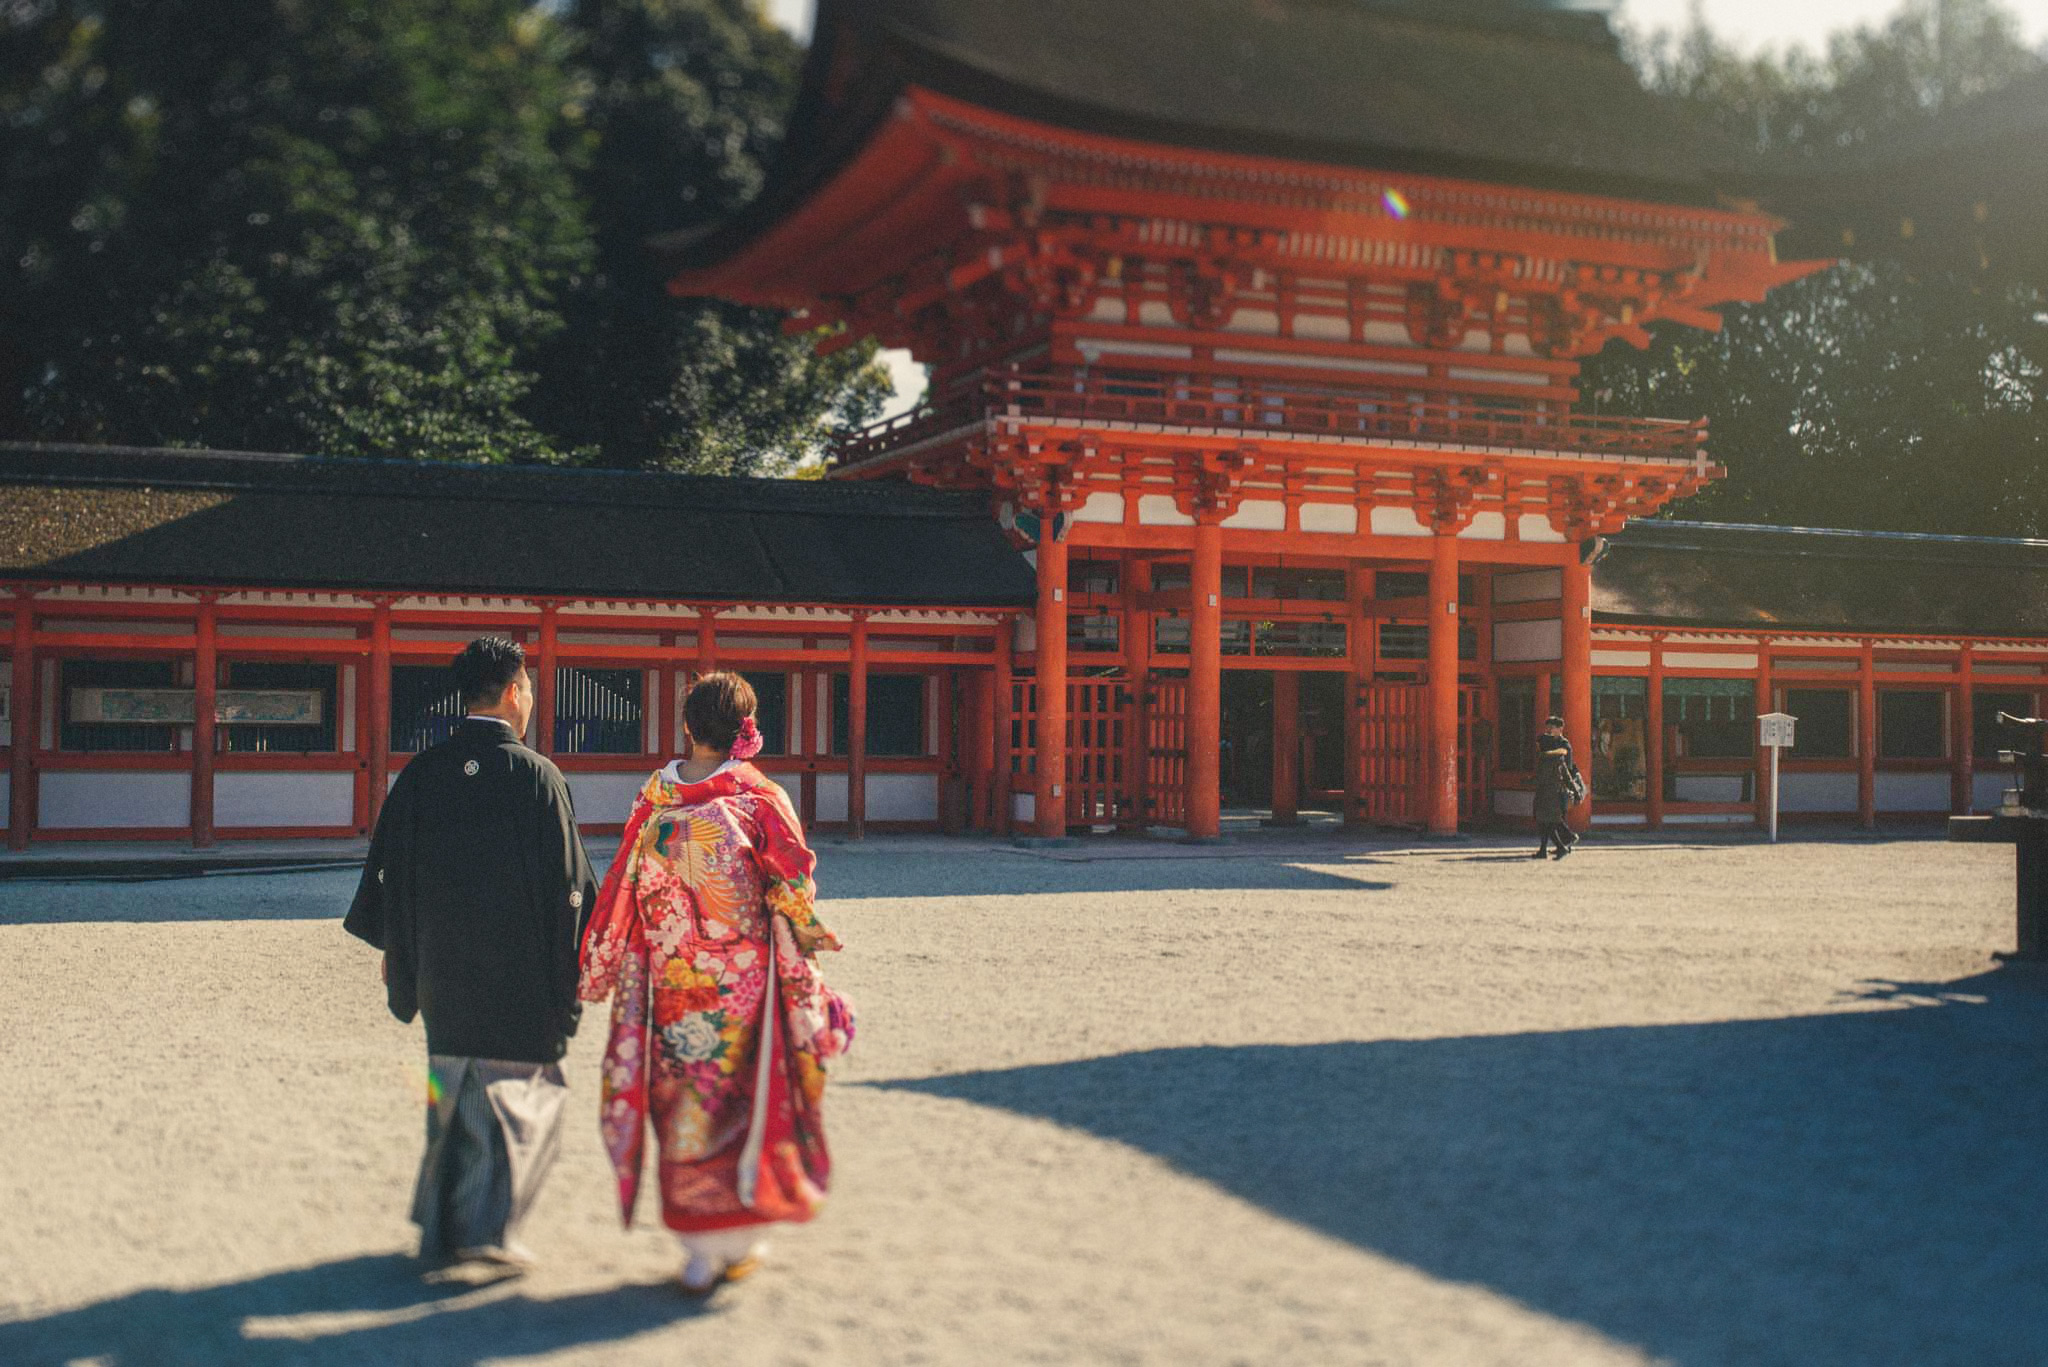 japan-wedding-photography-by-roberto-panciatici-photography-33